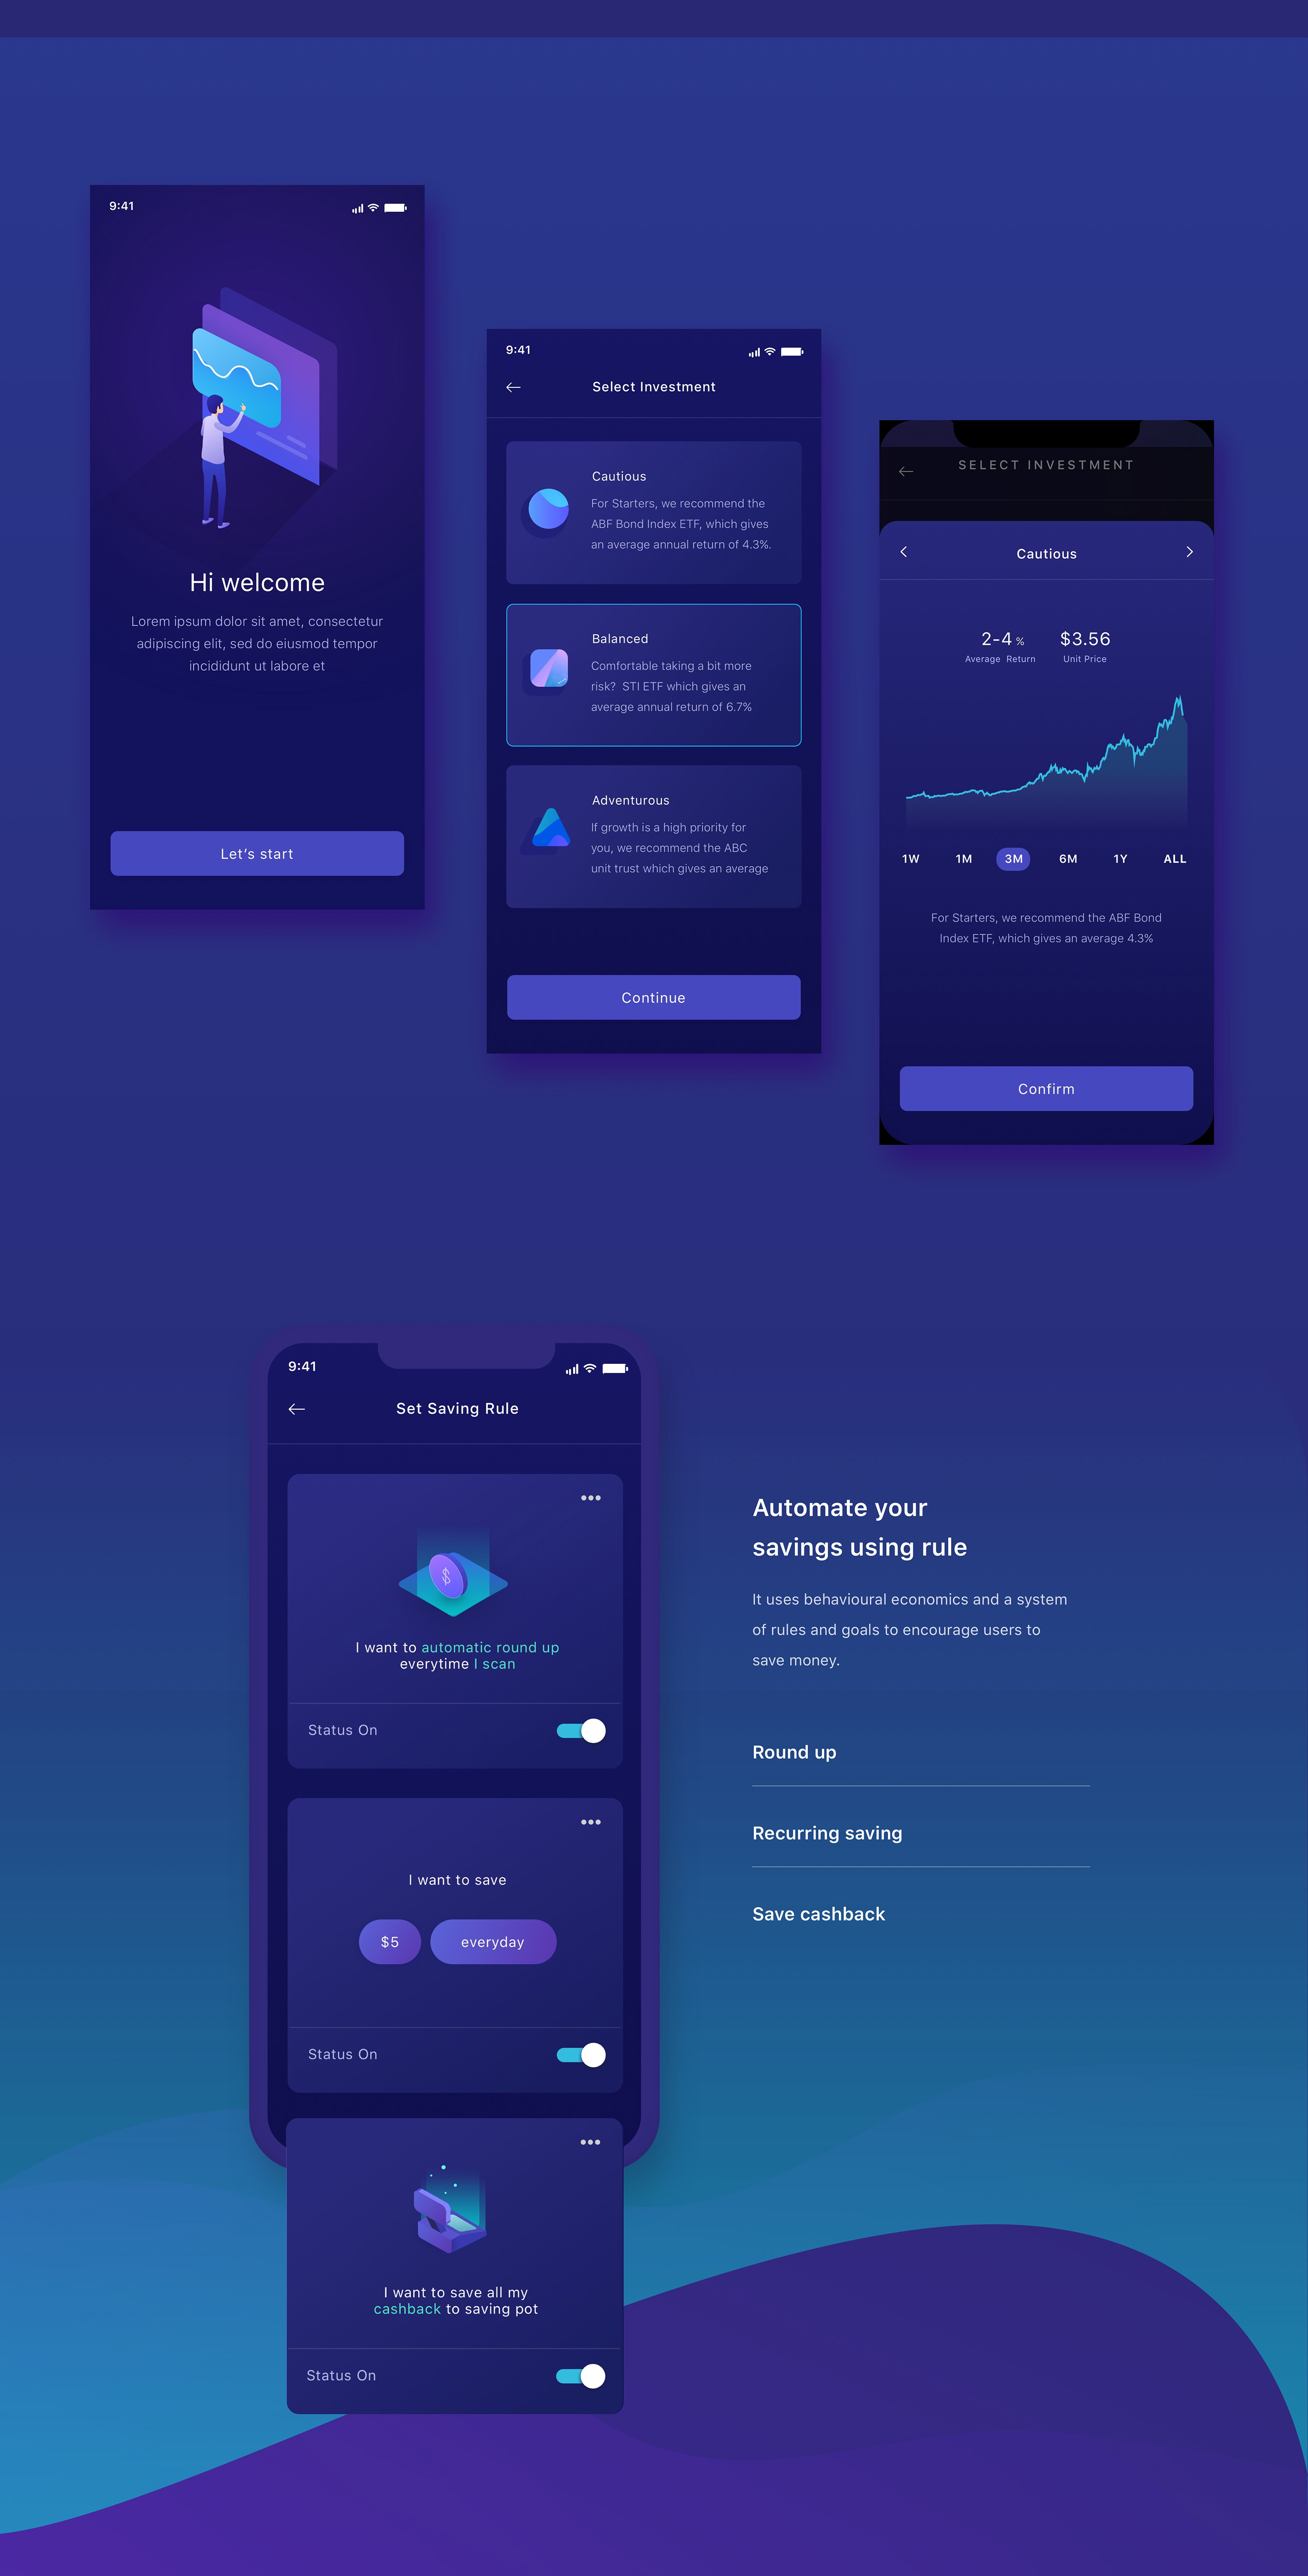 国际资讯_Invest Mobile App UI设计 - 视觉同盟(VisionUnion.com)